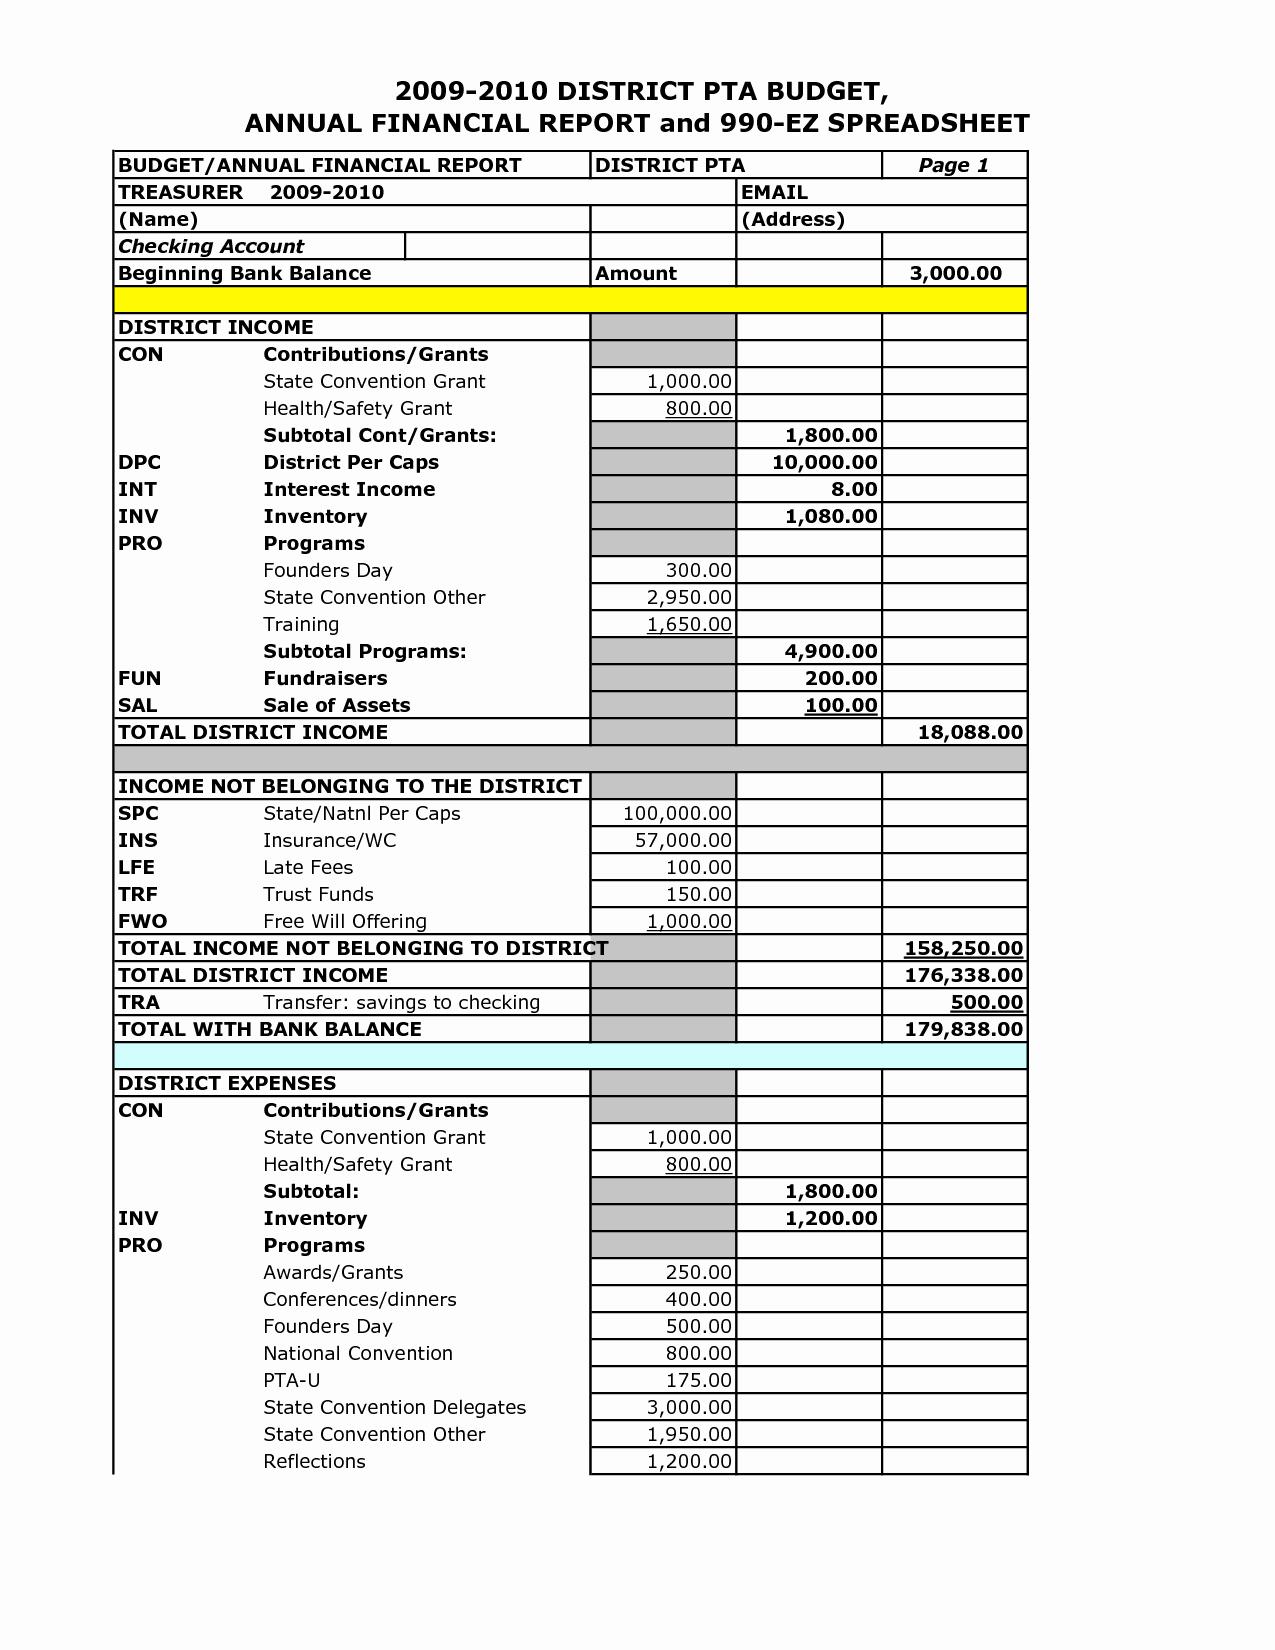 Non Profit organization Budget Template Luxury Best S Of Non Profit Annual Bud Template Non